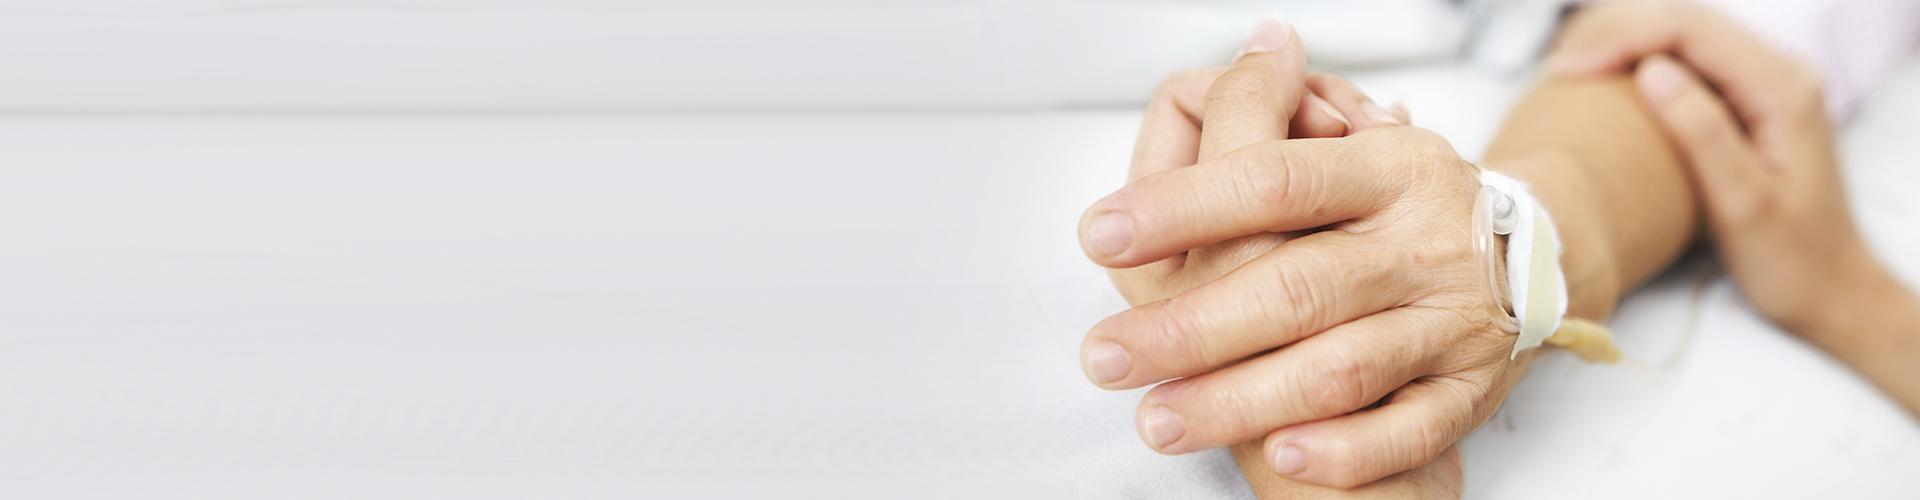 STIWELL Neurorehabilitation | information about stroke (apoplex)